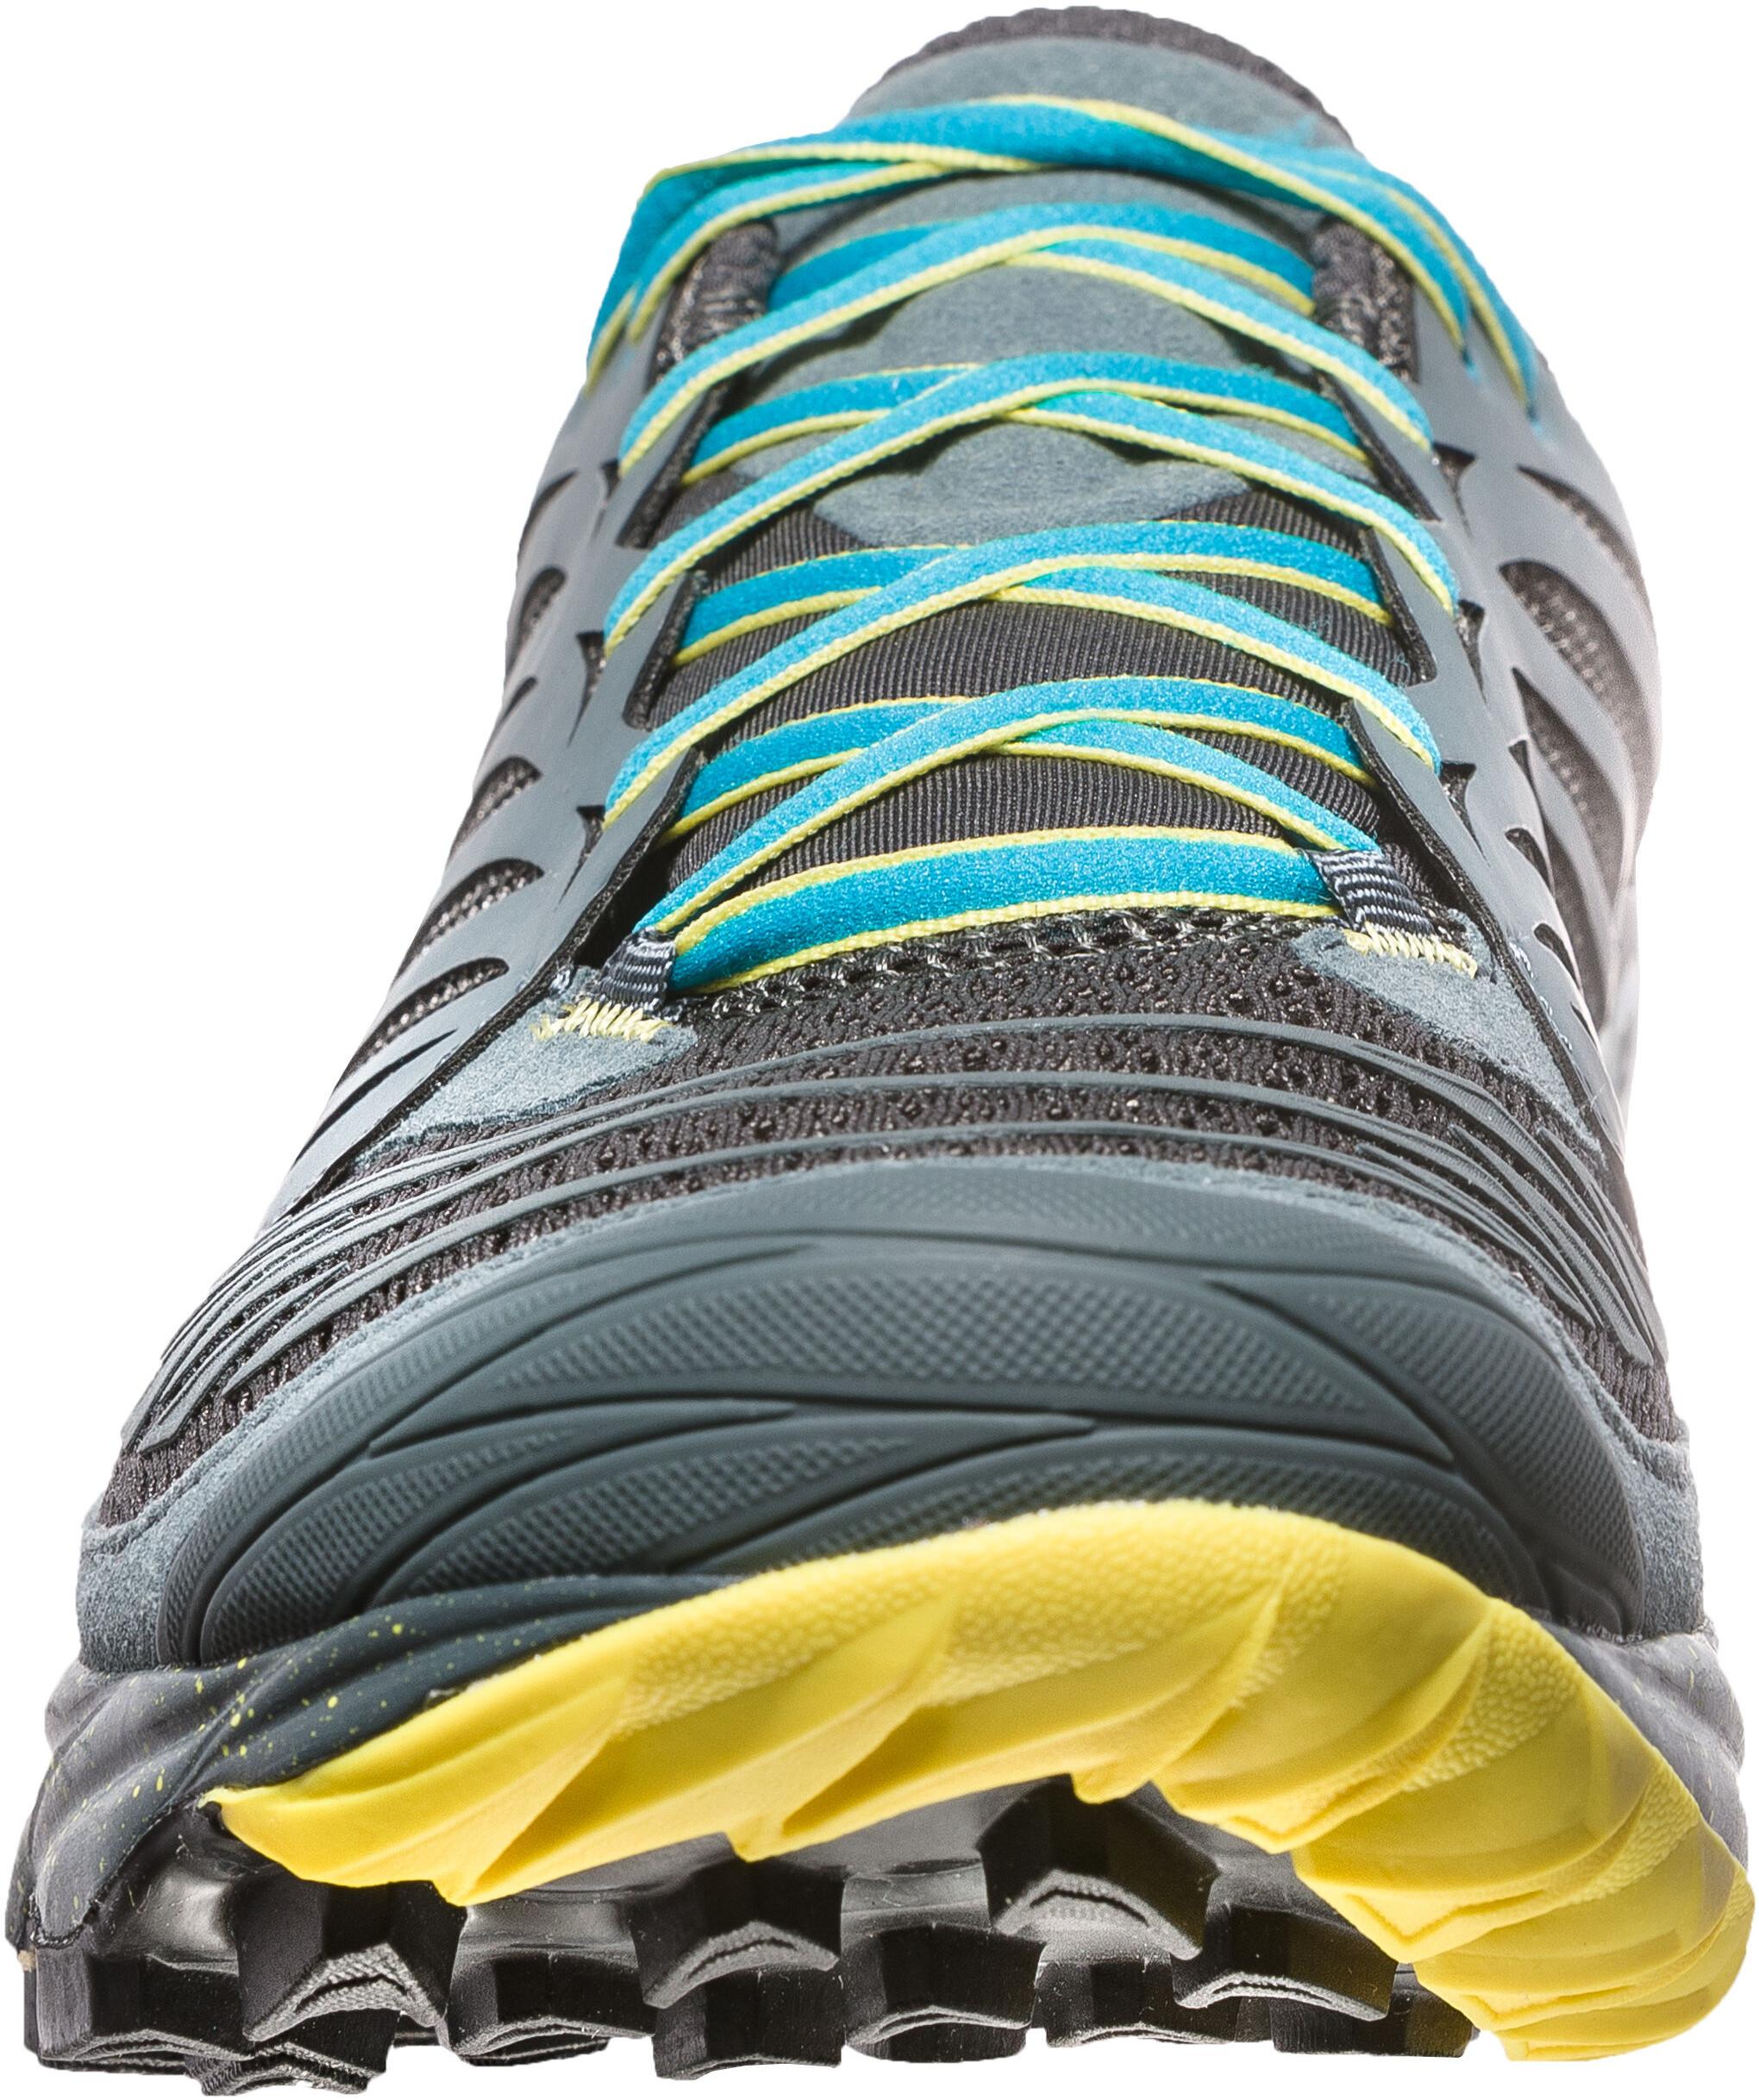 La Sportiva Akasha scarpe da corsa Uomo grigio turchese su Addnature 3b29d3aff25